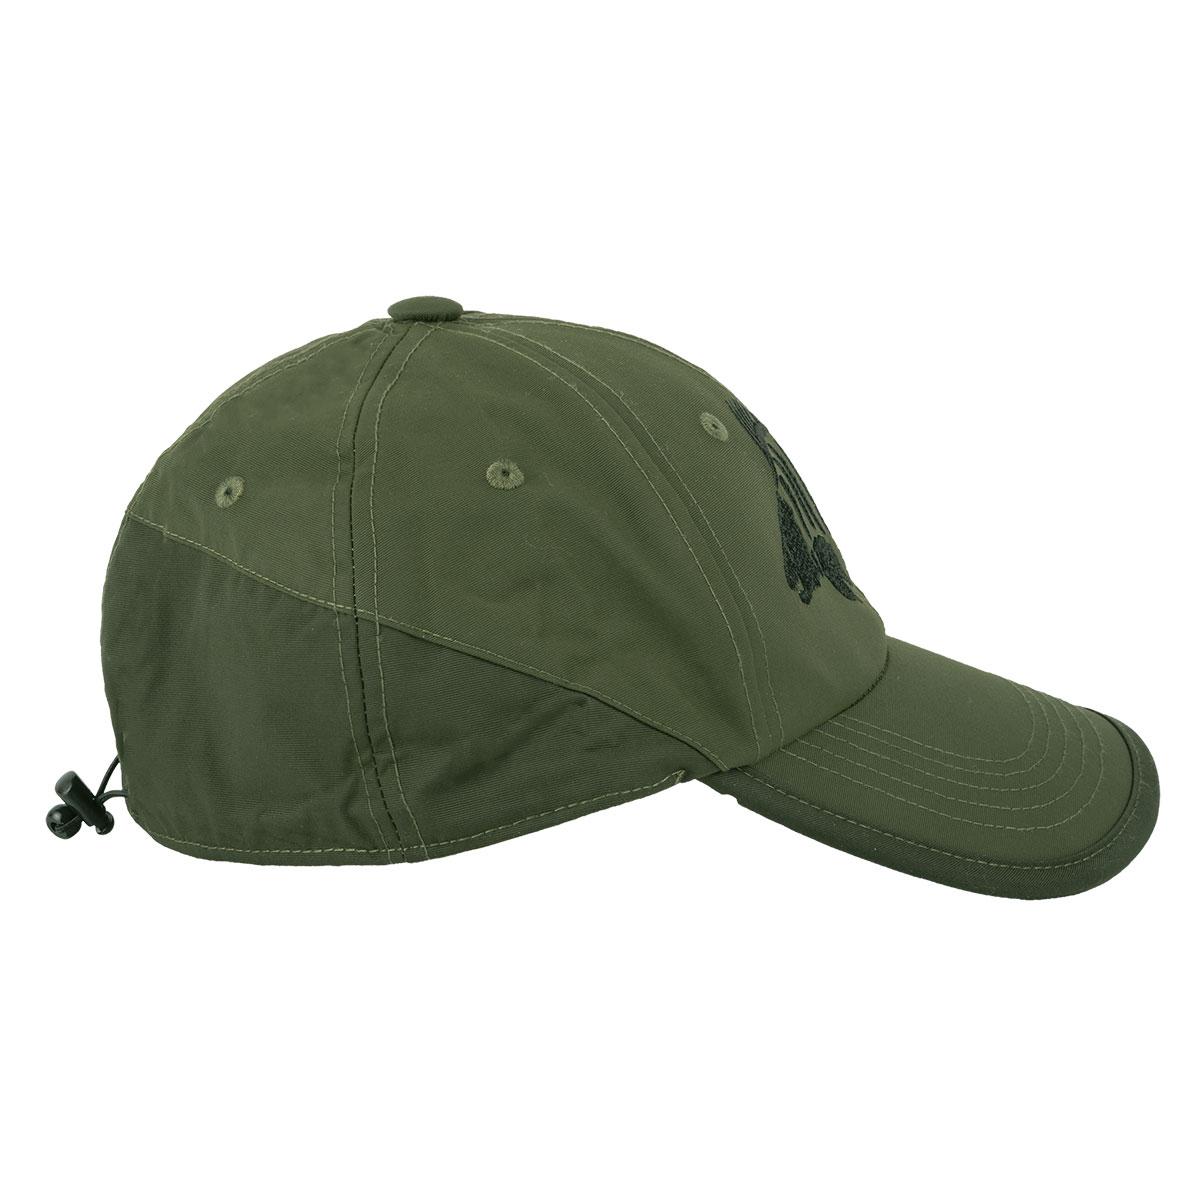 Pinewood Wildmark 2.0 Cap Basecap Angelcap grün